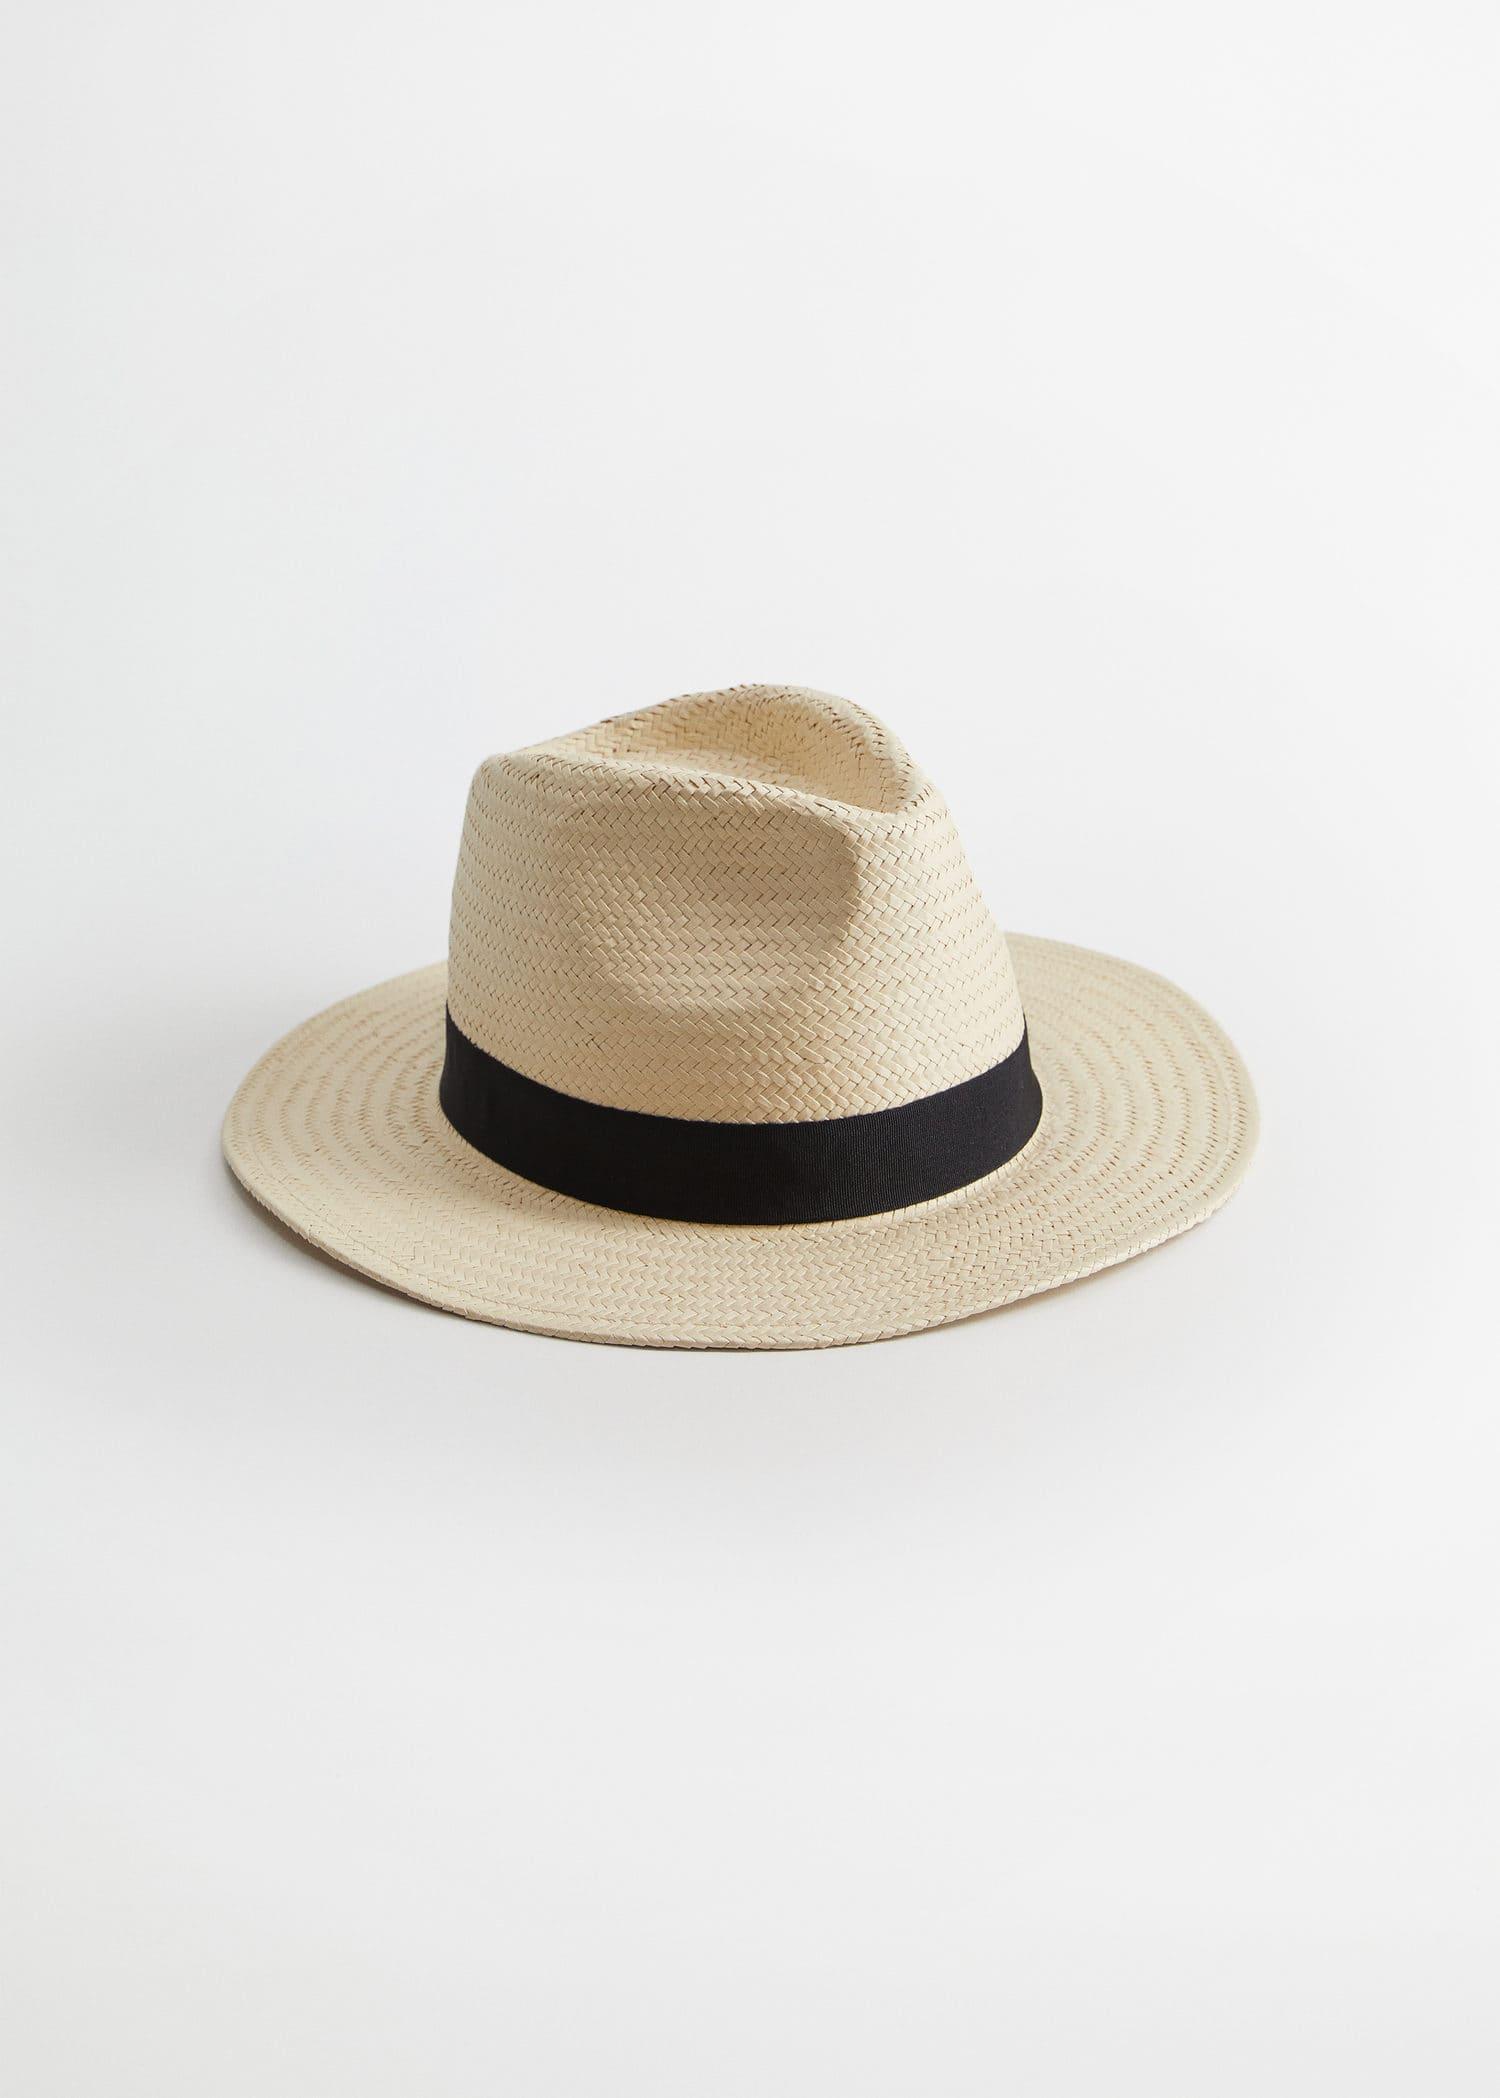 Chapéus e bonés de Homem 2020 | Mango Man Portugal